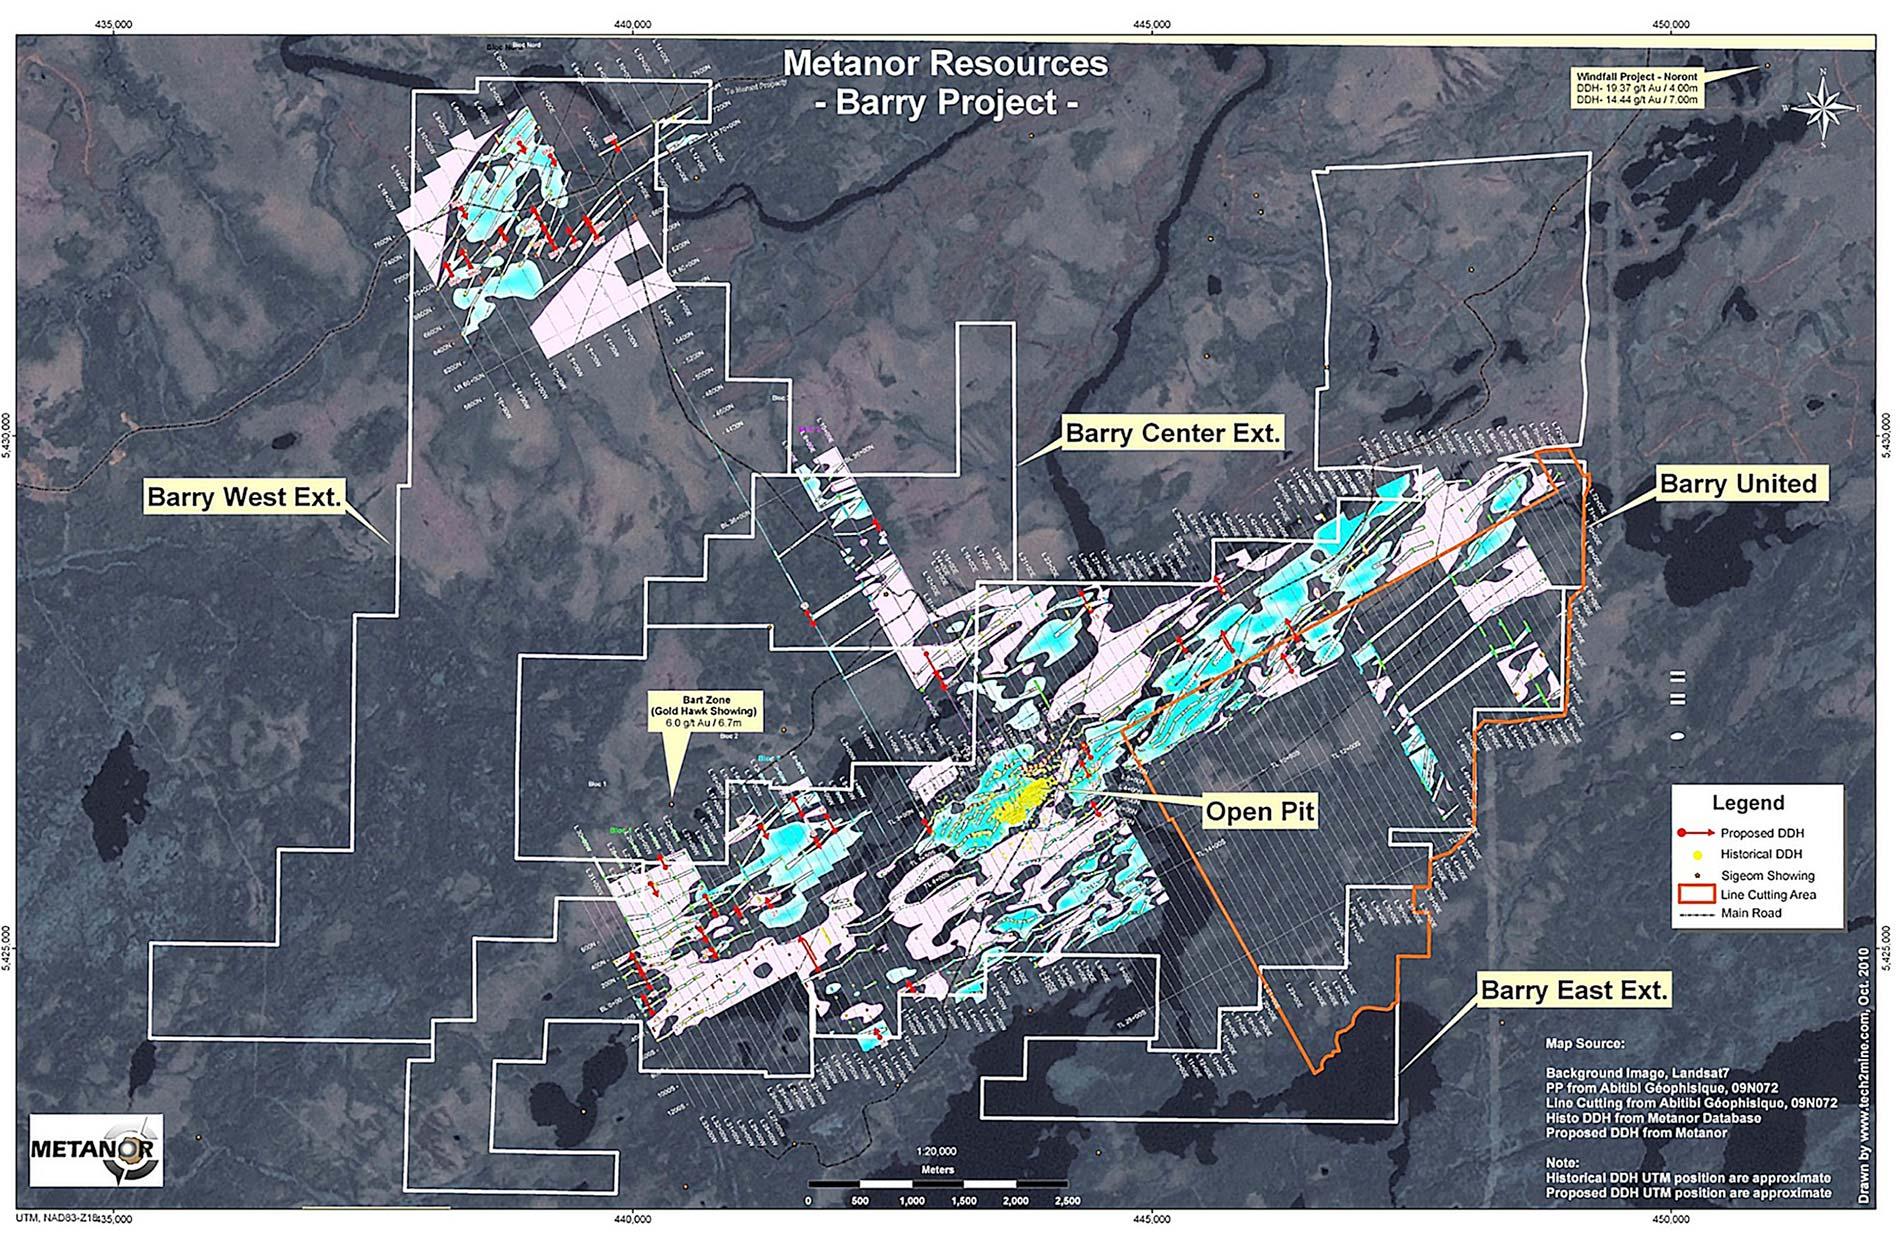 Landsat map of PP from Abitibi Géophysique (November 2009) on the Barry property